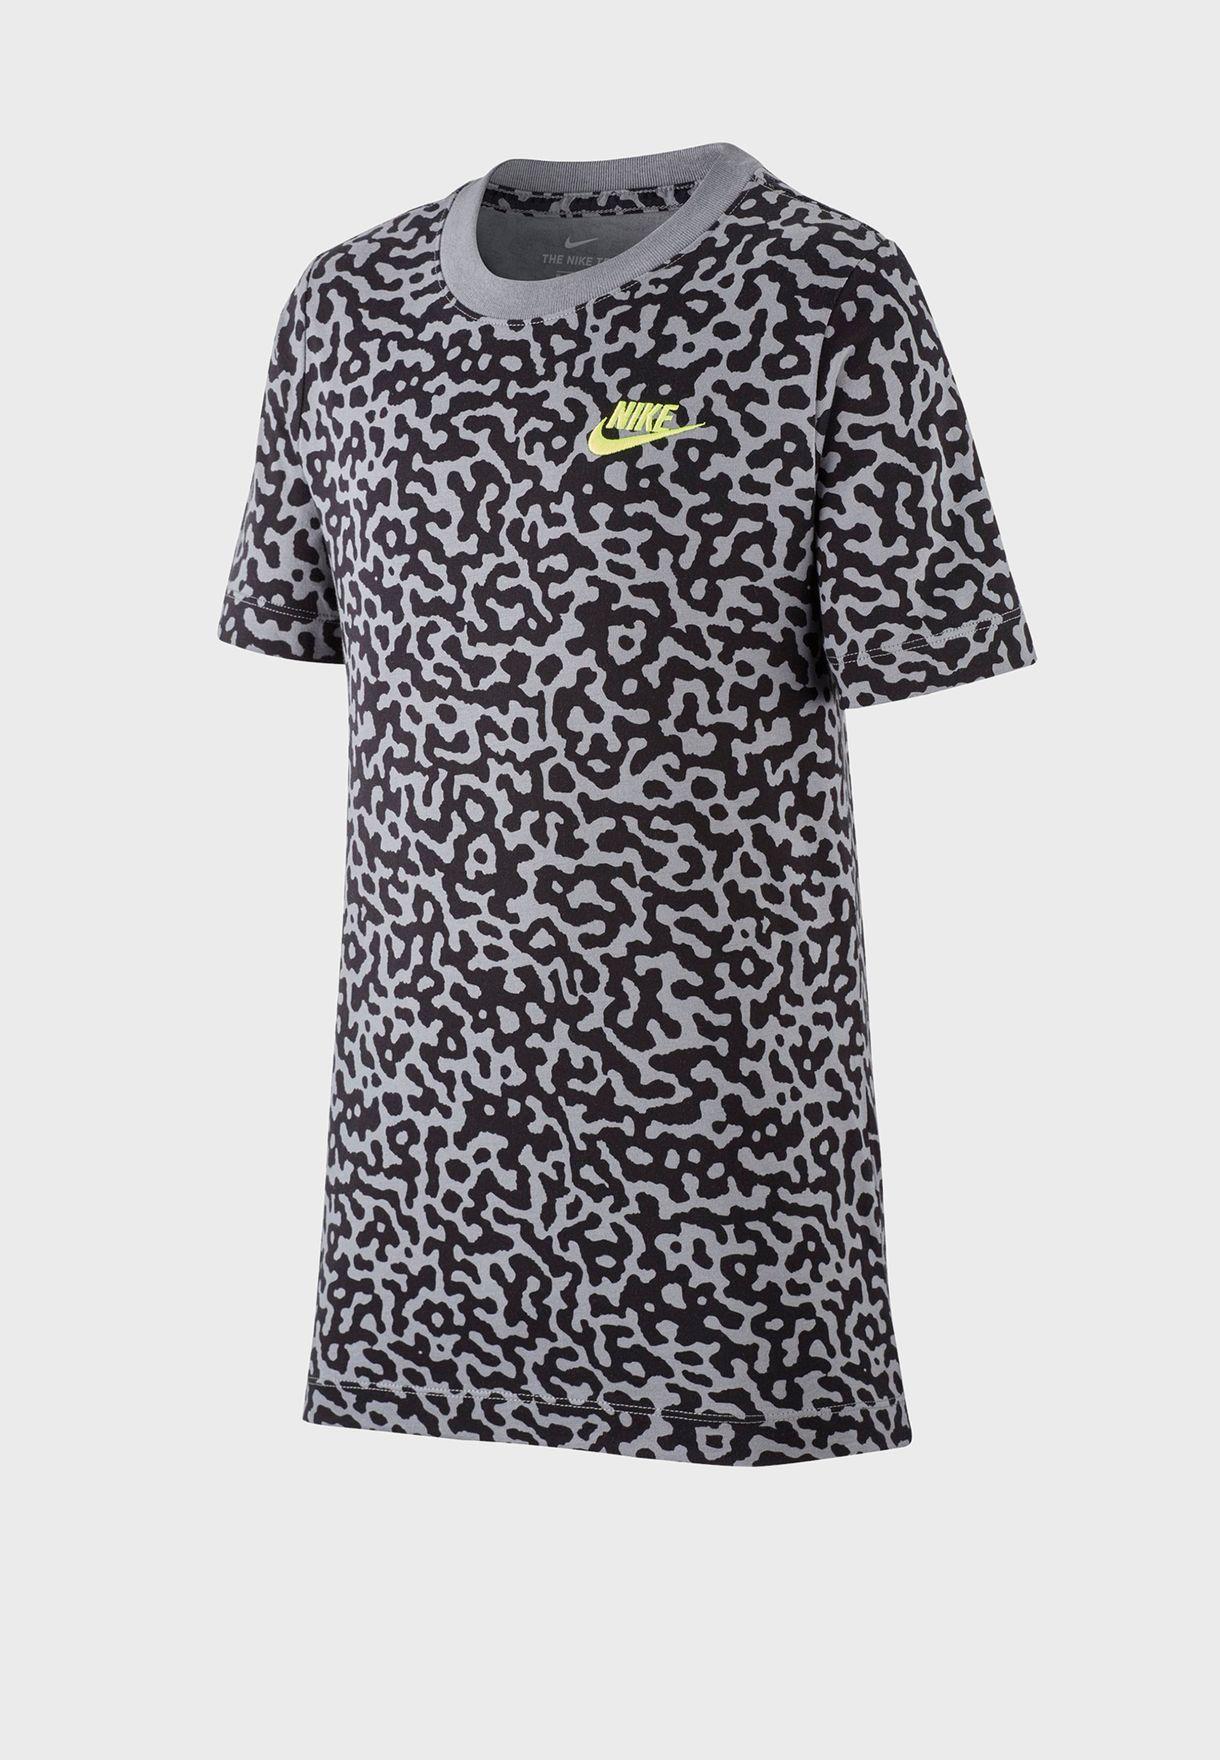 Youth NSW Mezzo AOP T-Shirt